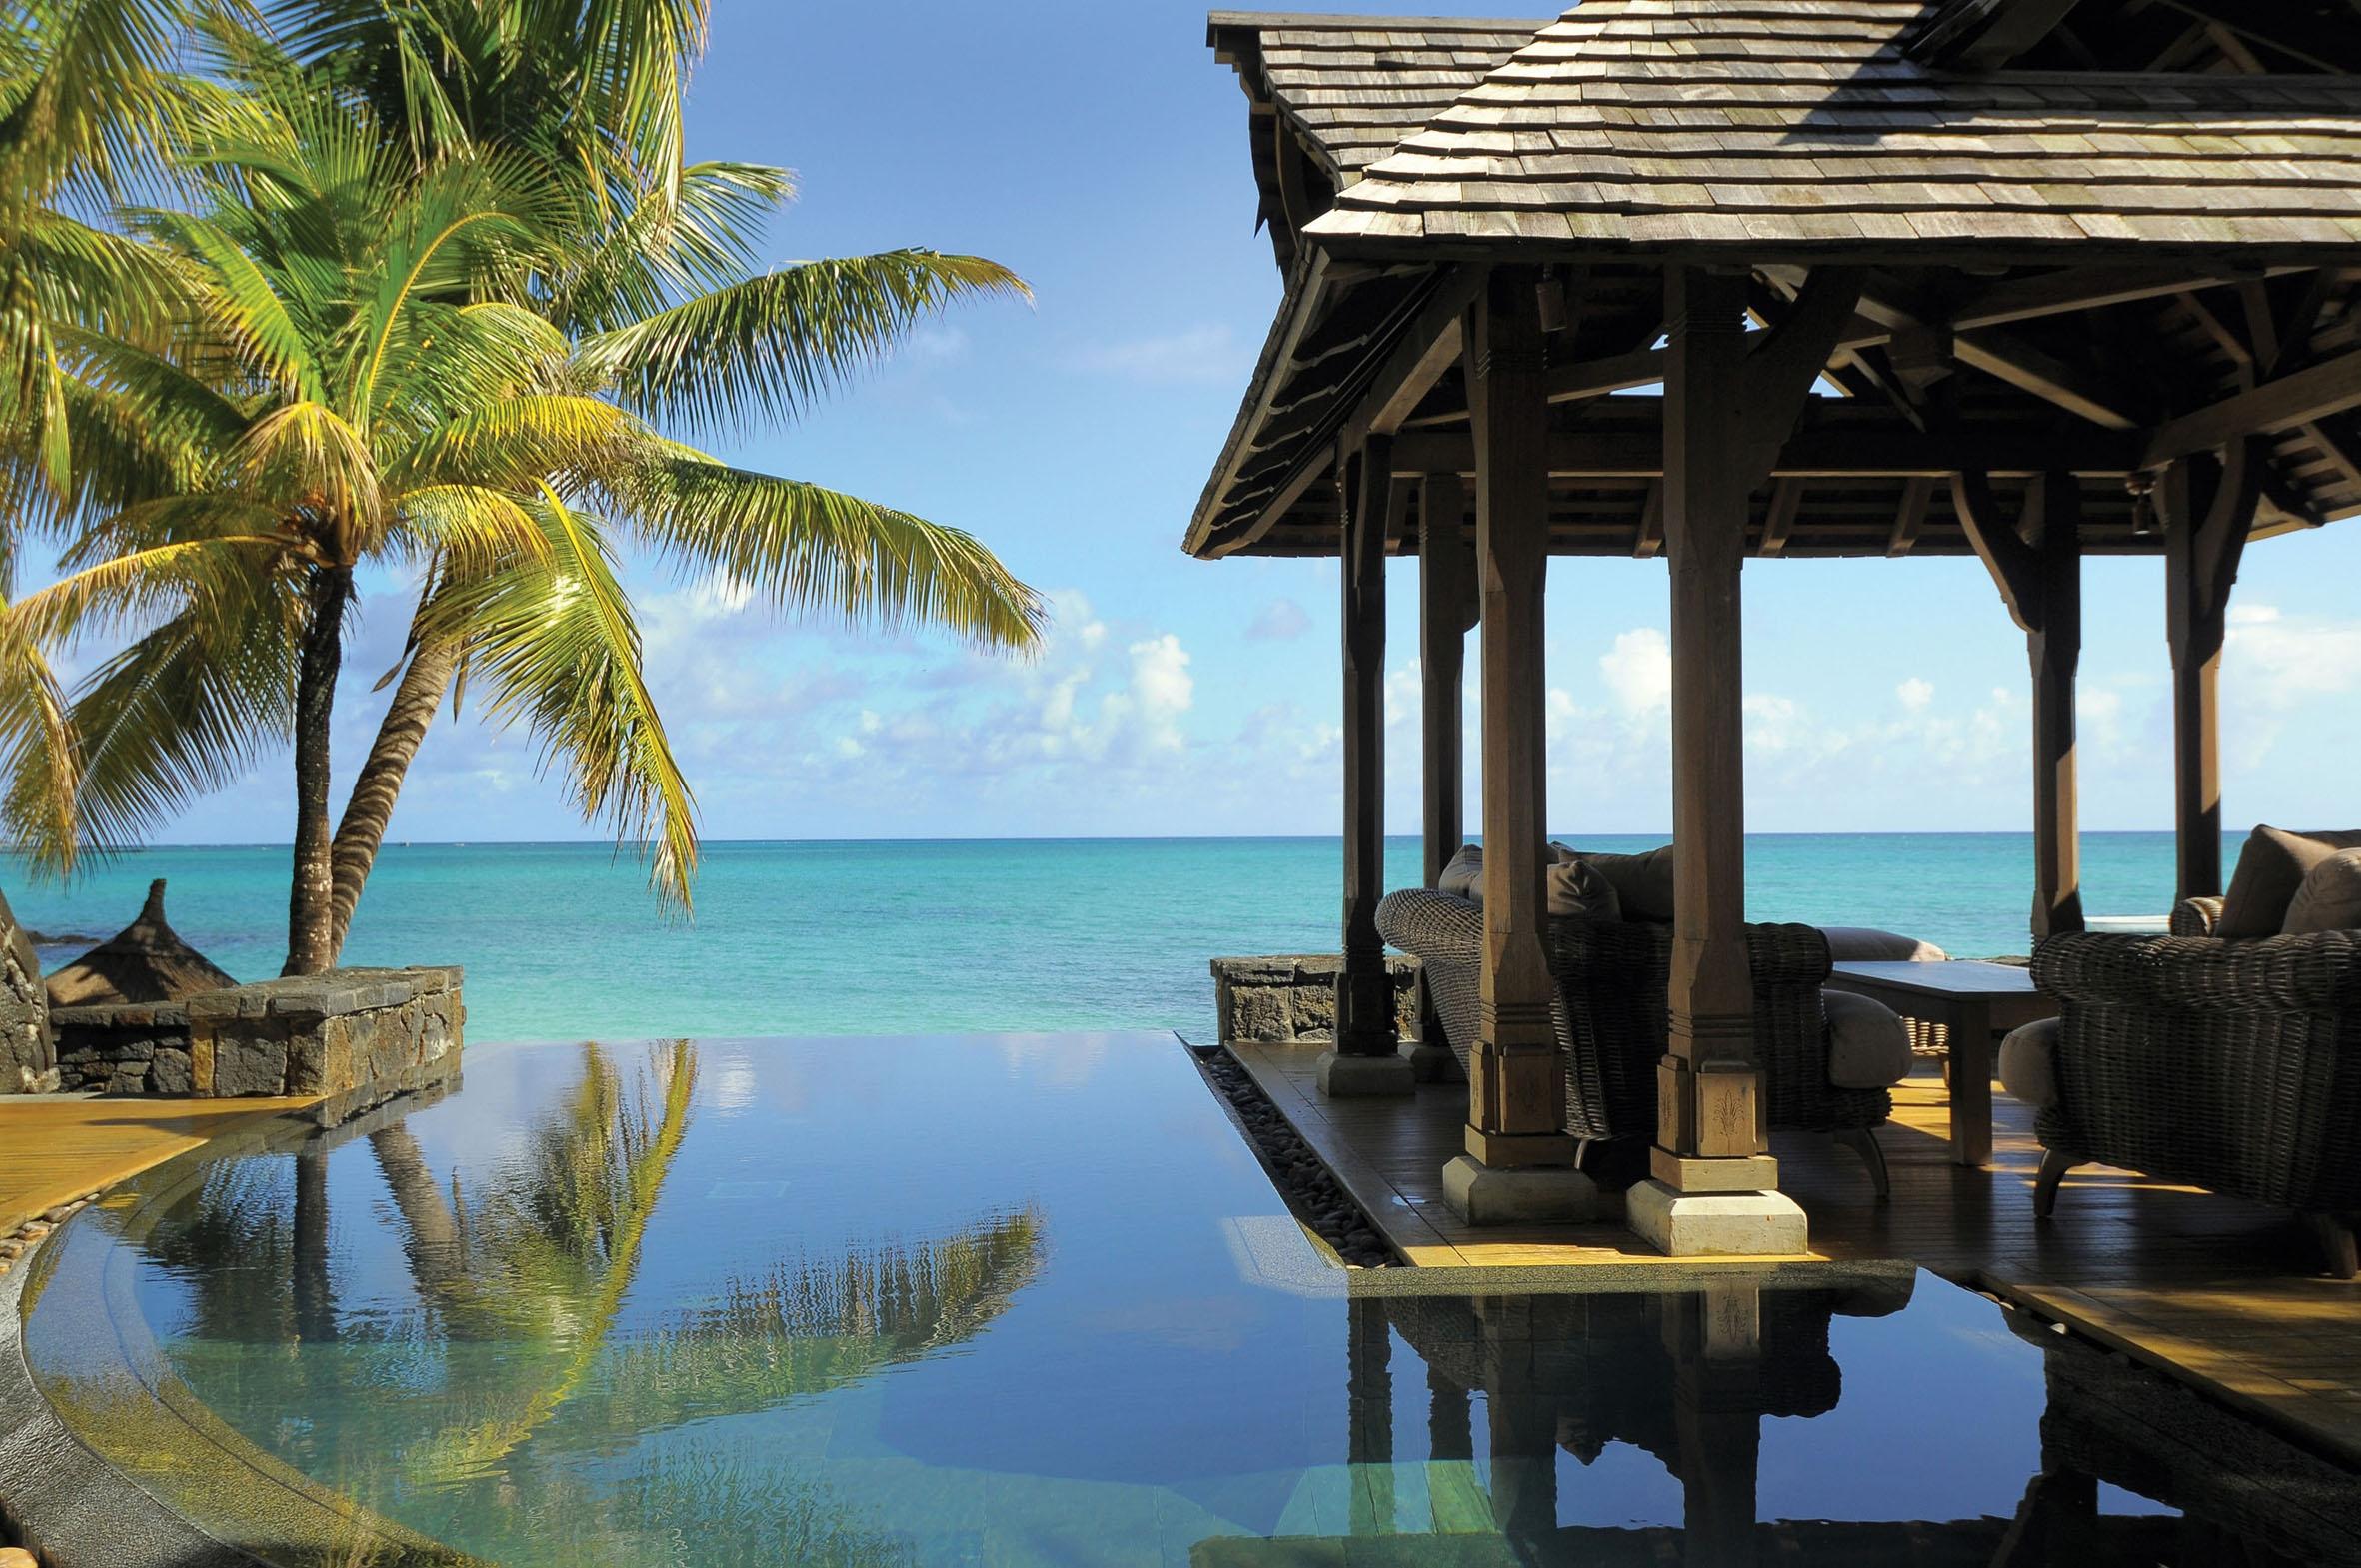 Beachcomber blog corporativo de bookingfax part 2 for Hoteles de lujo fotos